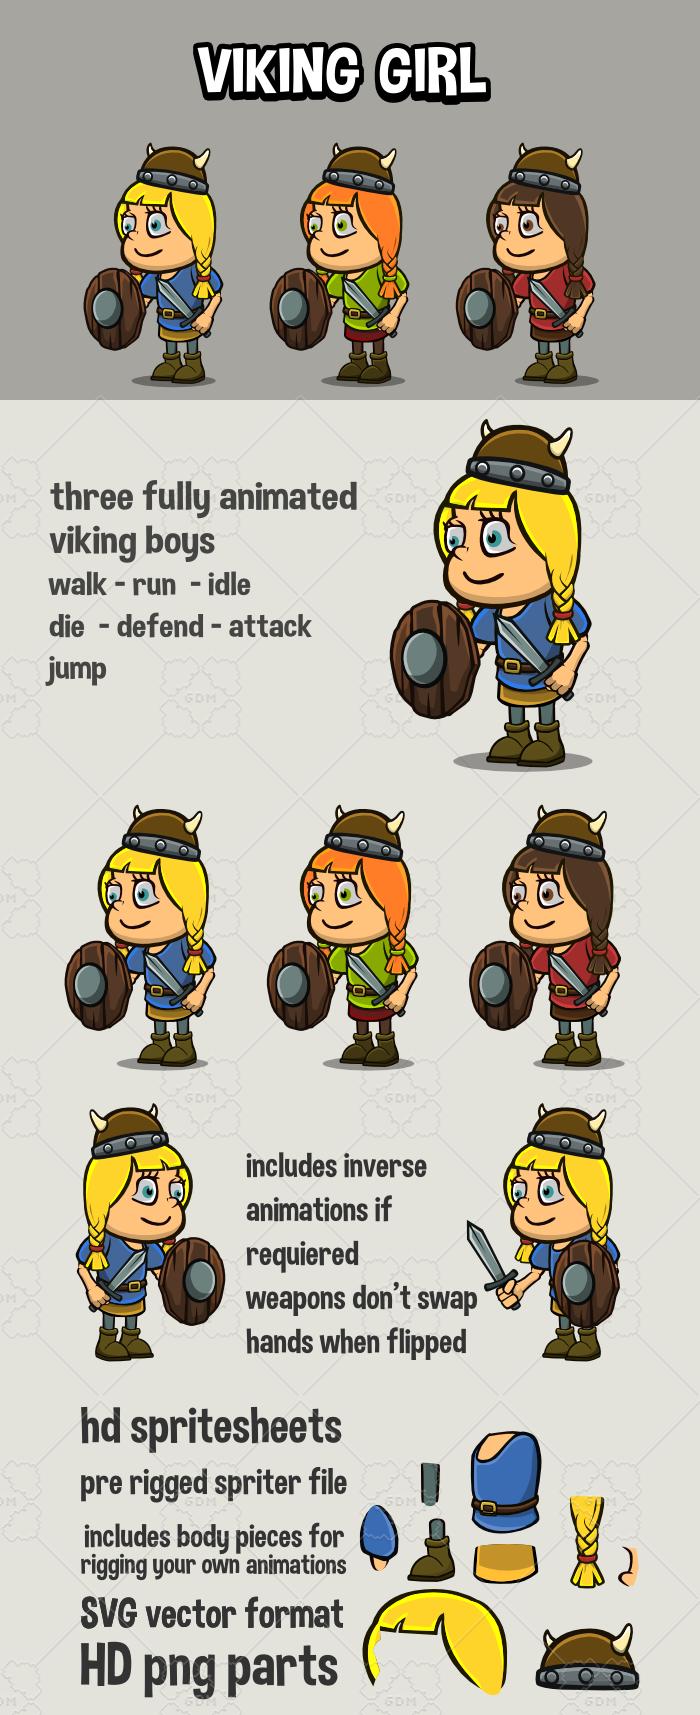 Animated viking girl